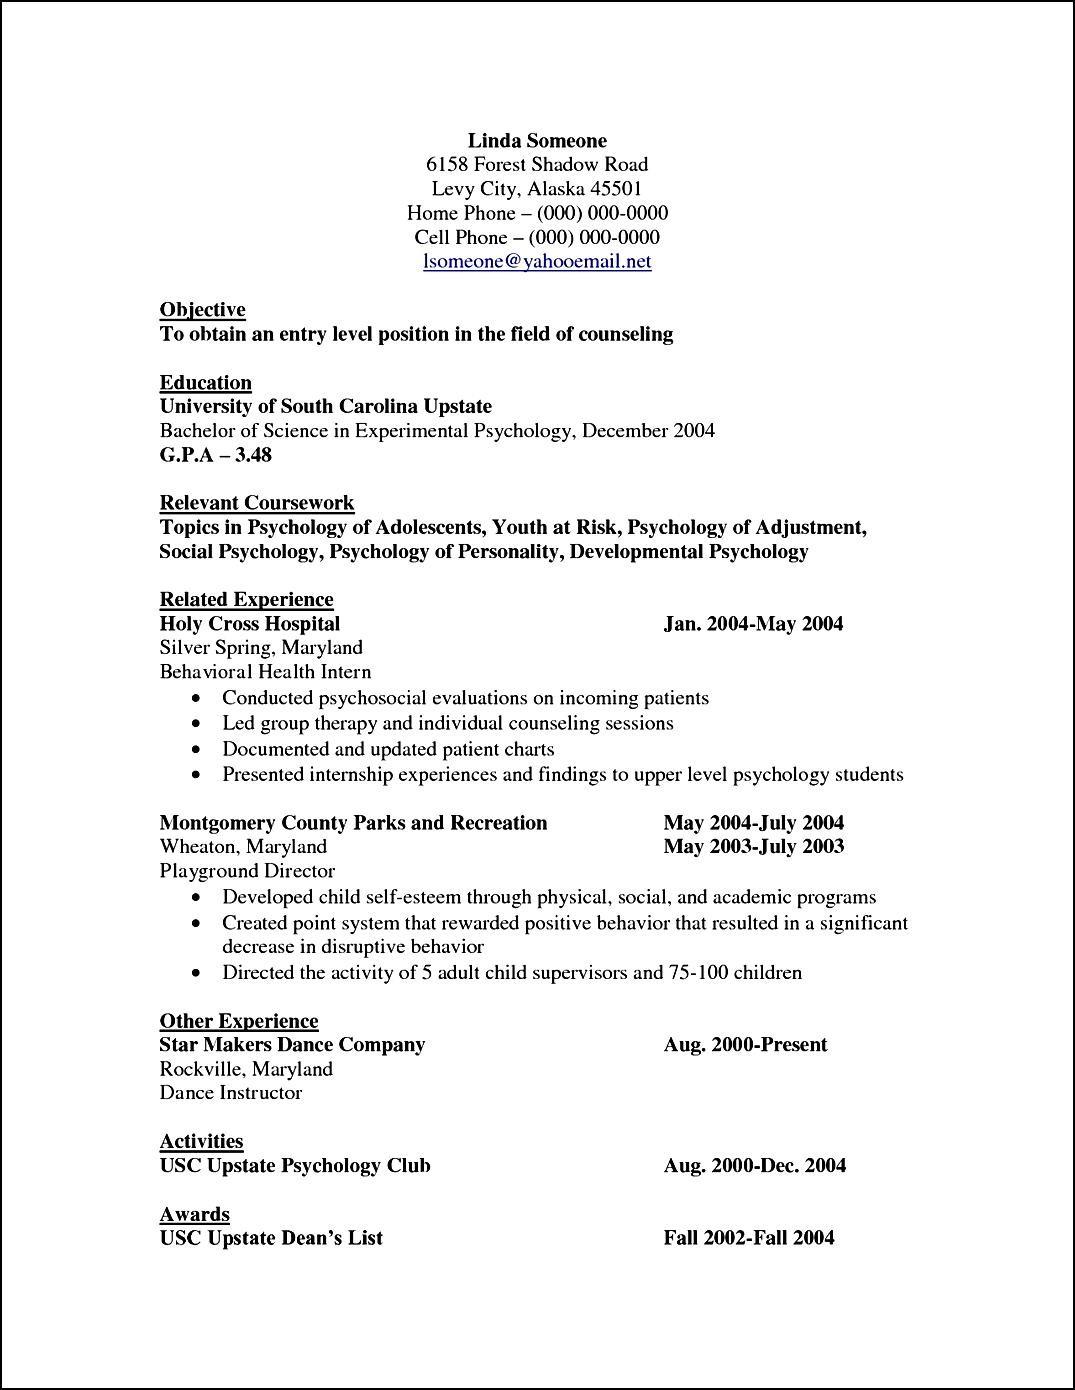 Curriculum Vitae Template For Psychologist